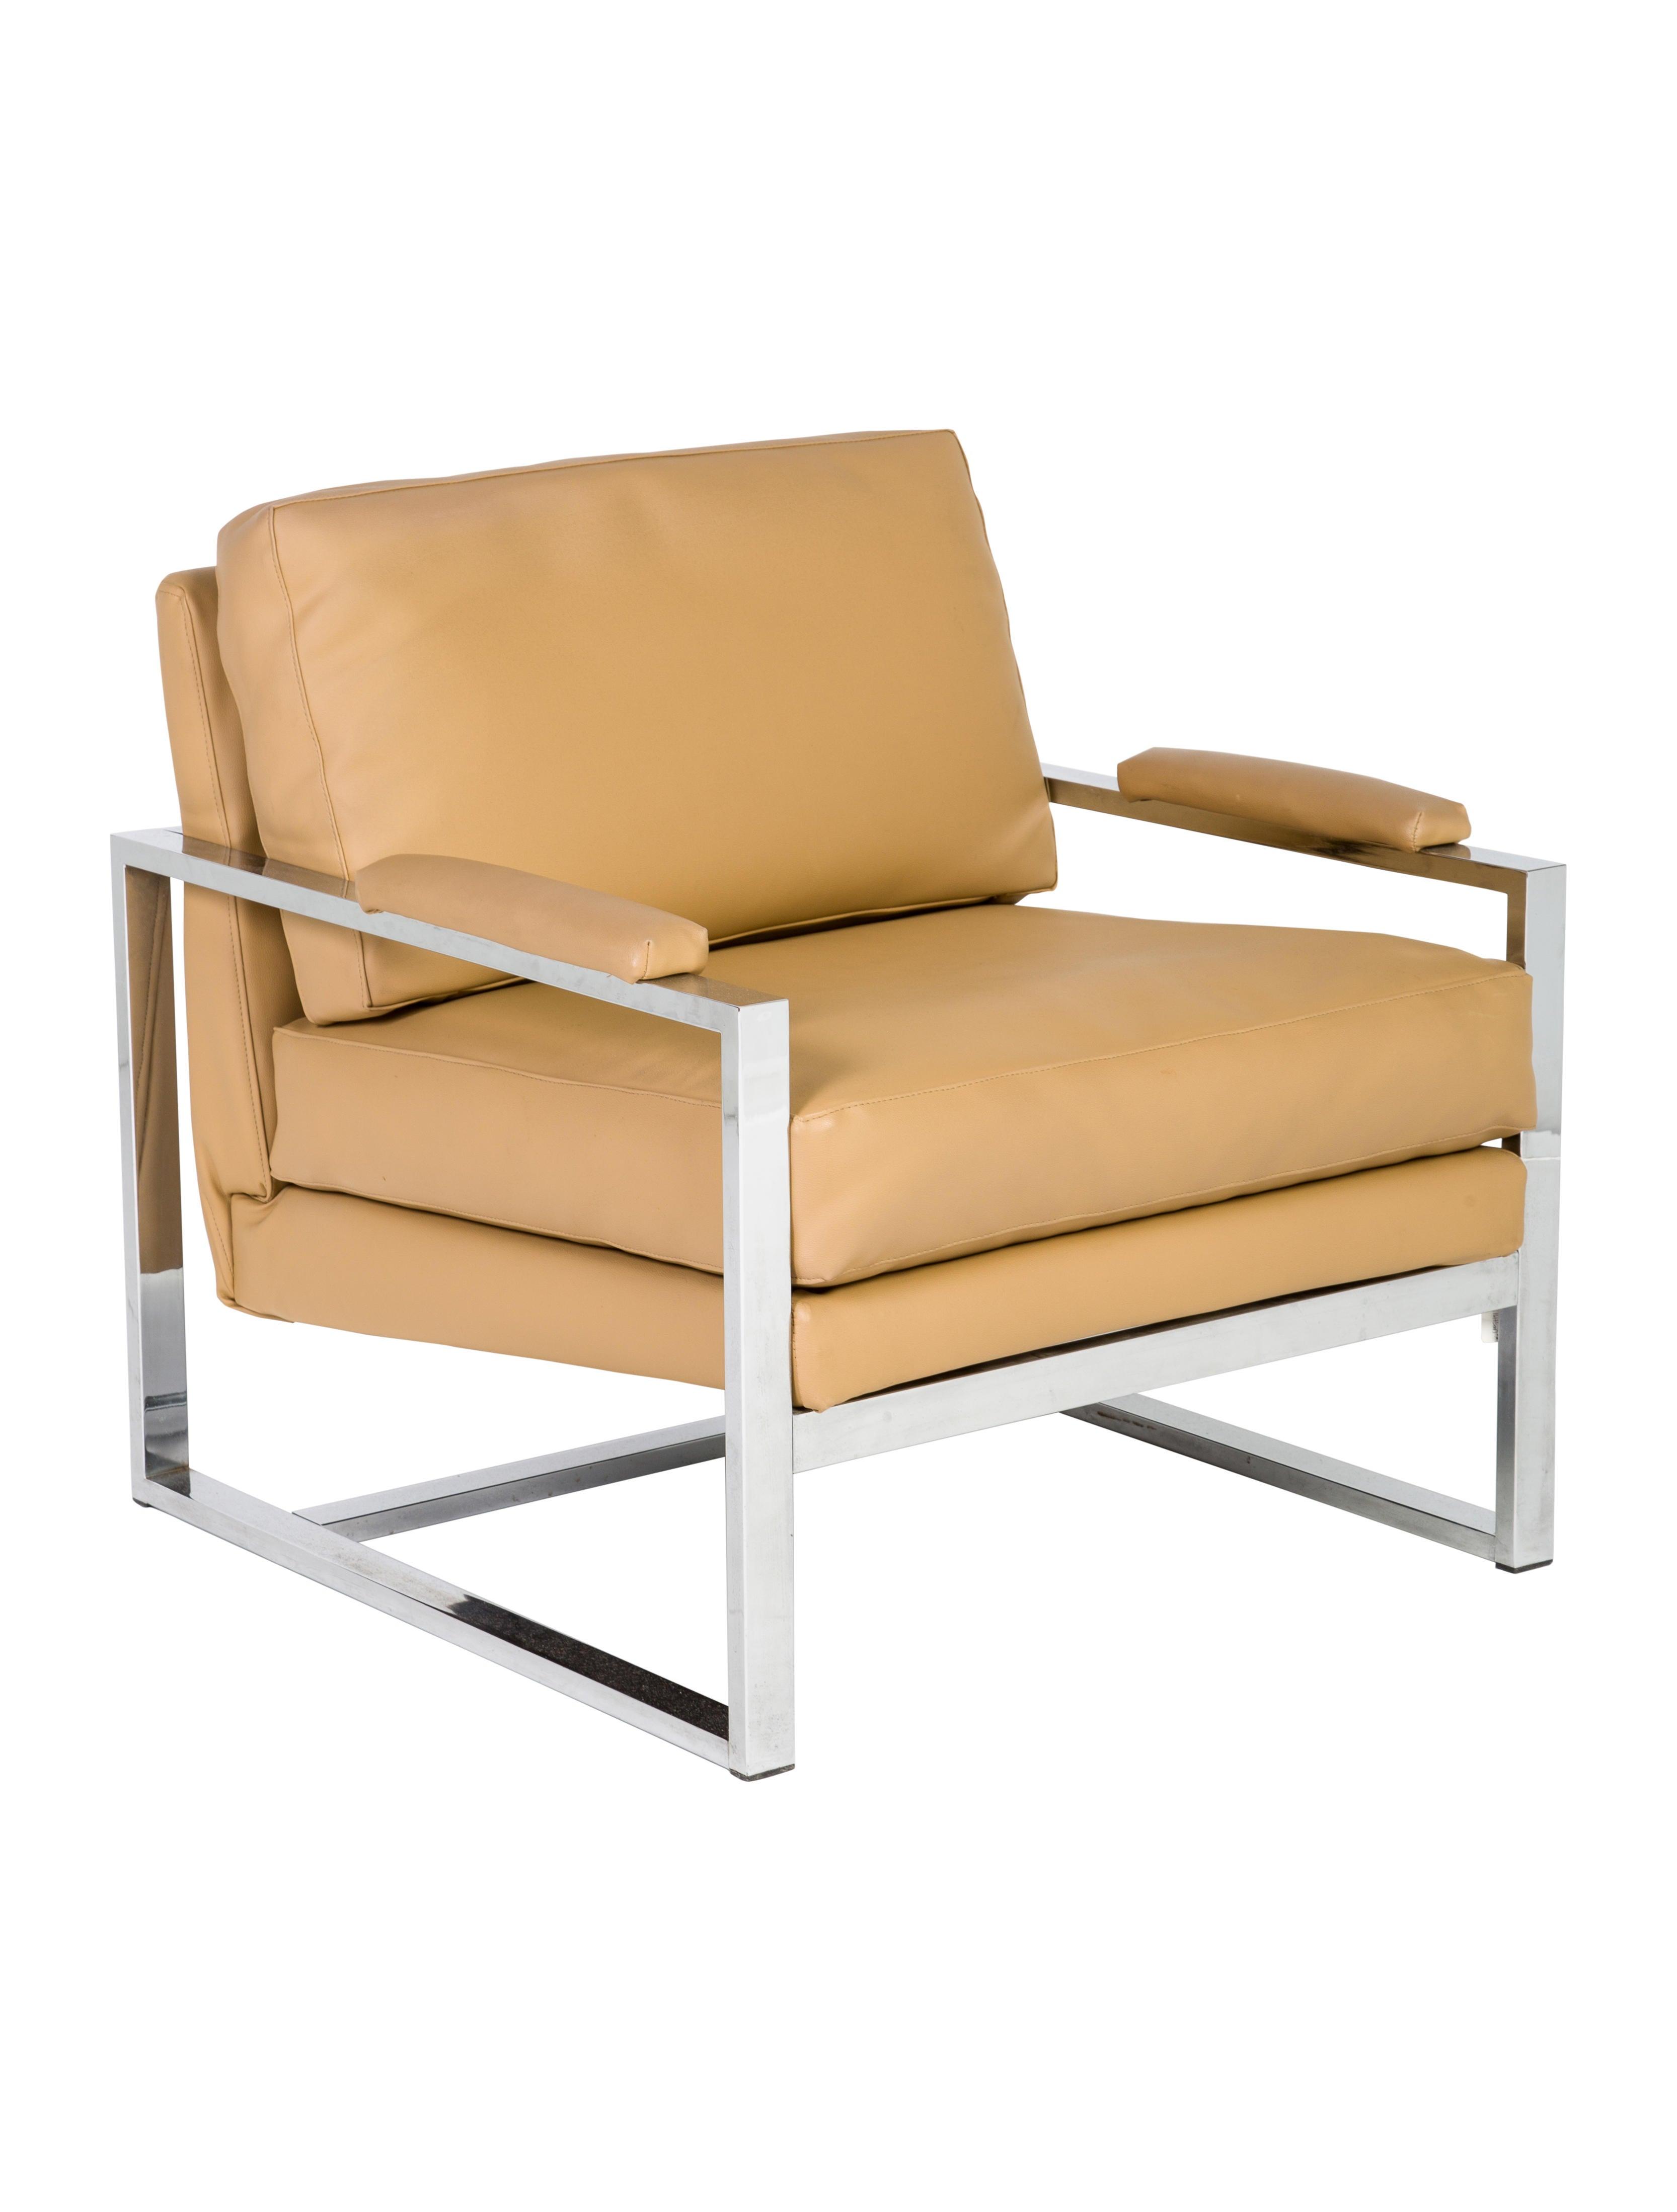 Great Milo Baughman Style Mid Century Modern Lounge